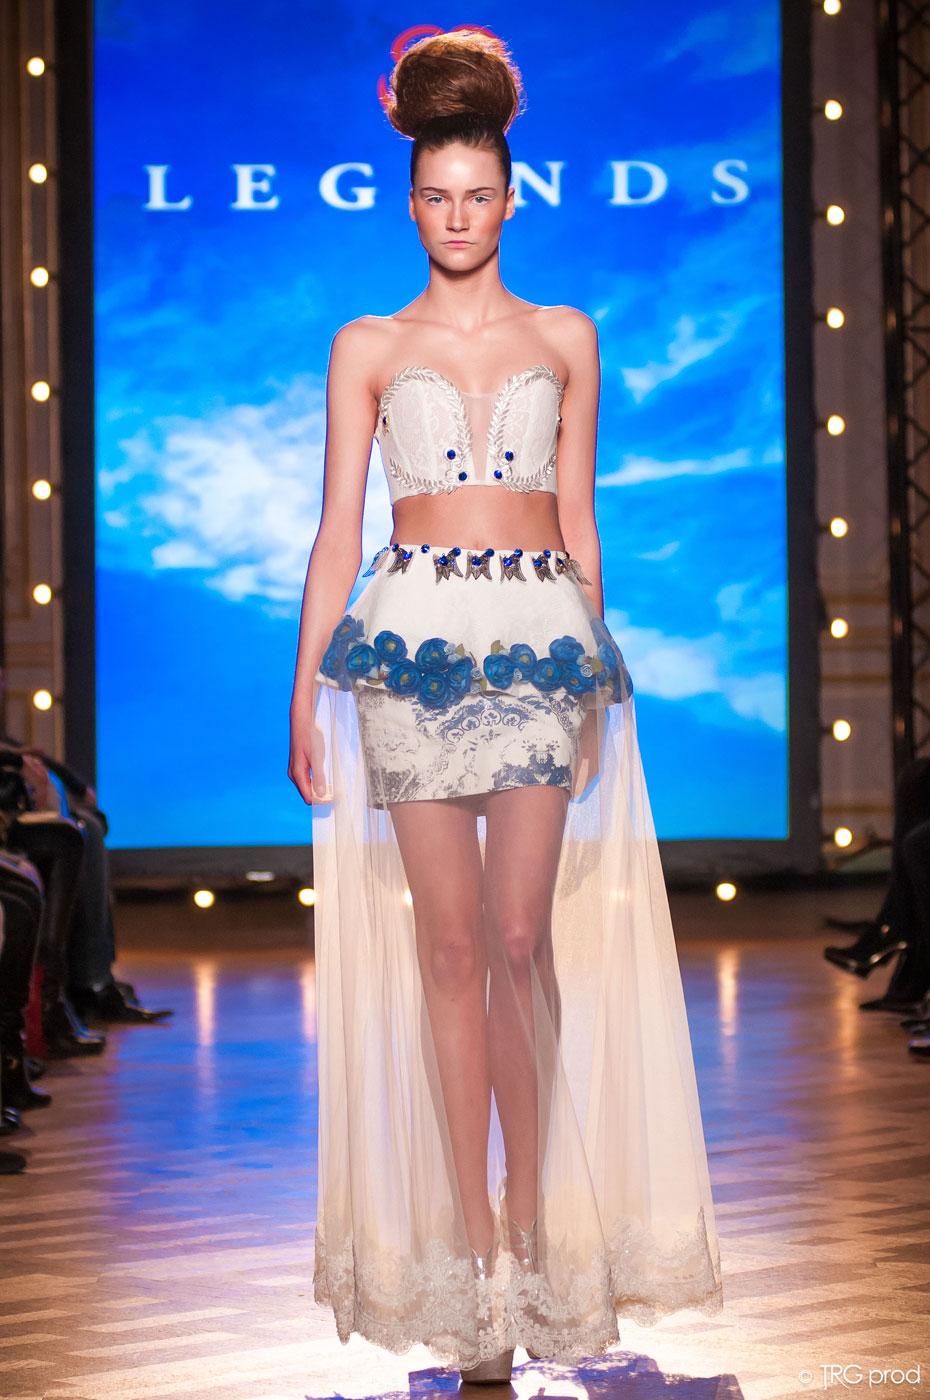 Legends-fashion-runway-show-haute-couture-paris-spring-2015-the-impression-03